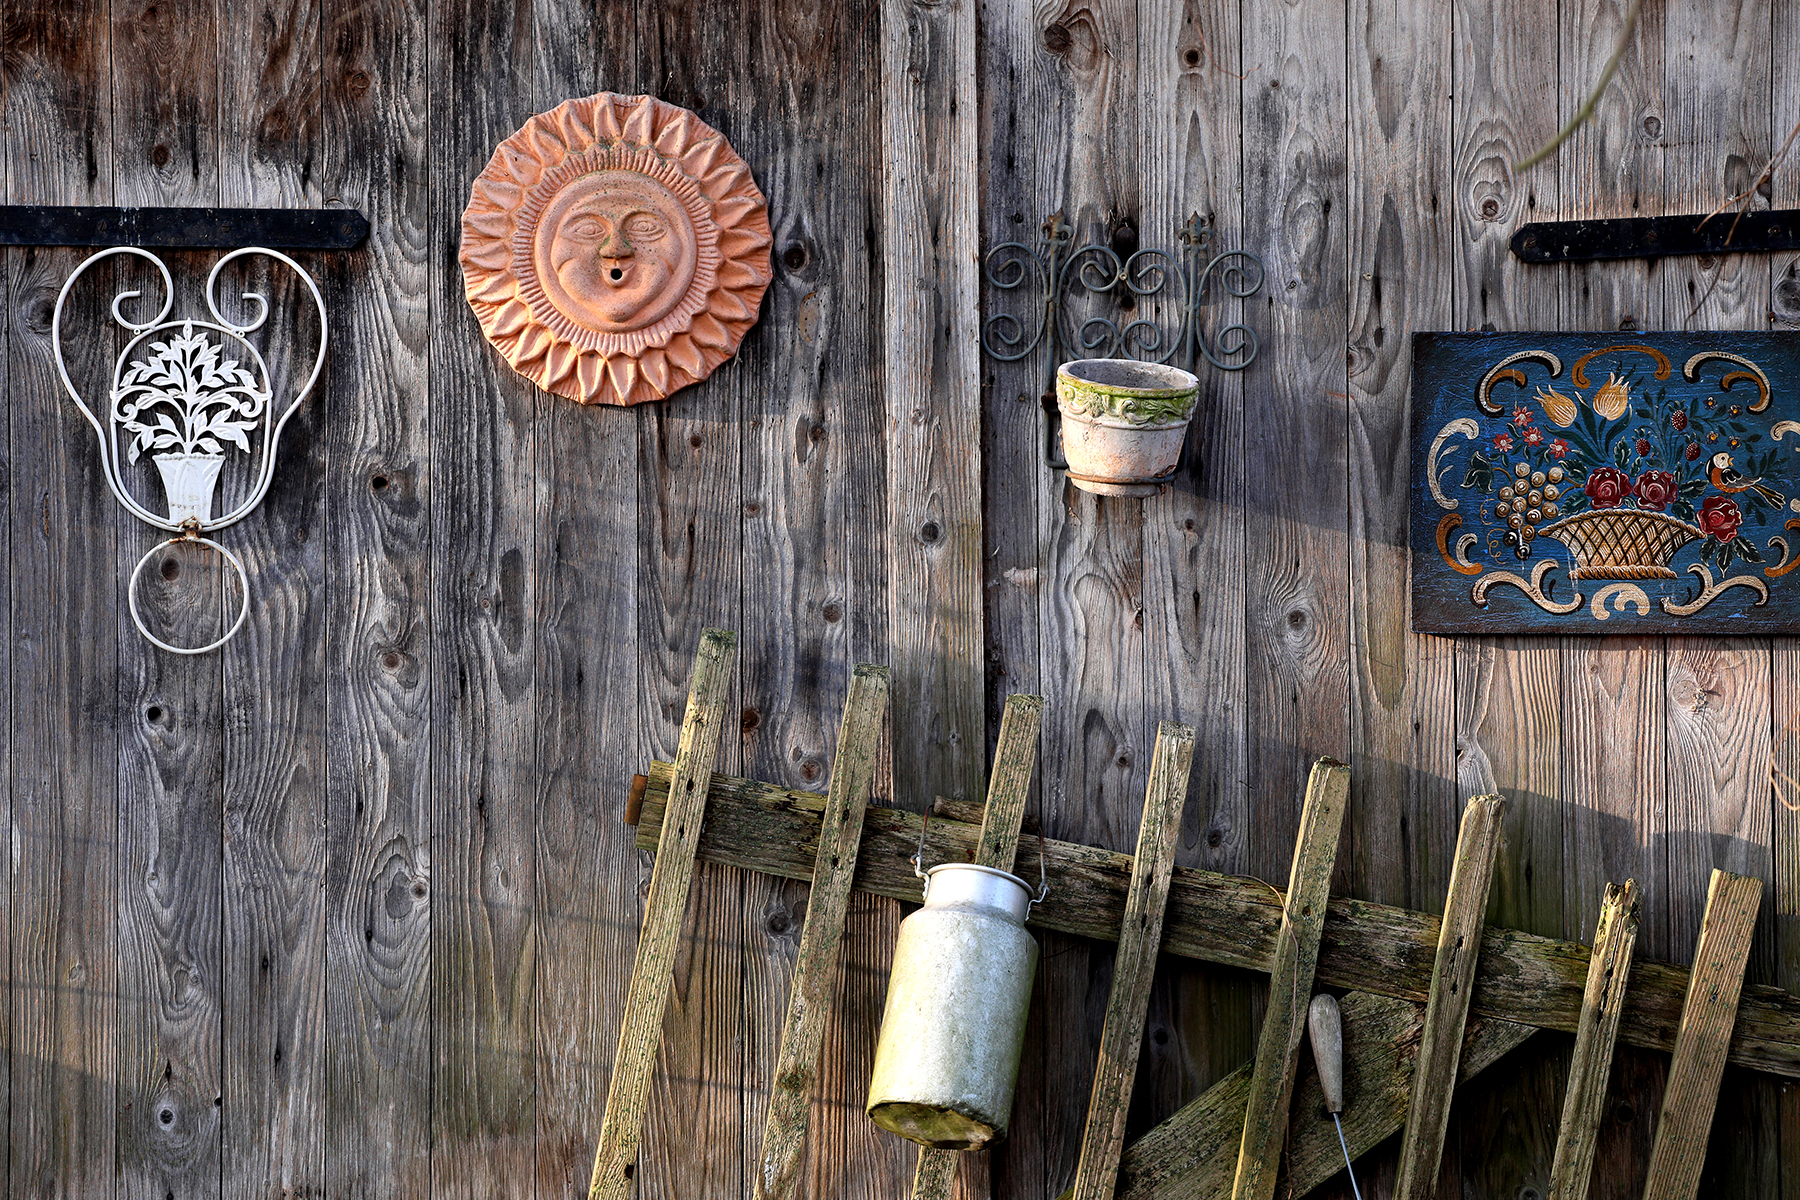 Holzwand fotografiert mit Sigma 70_200 mm Sports